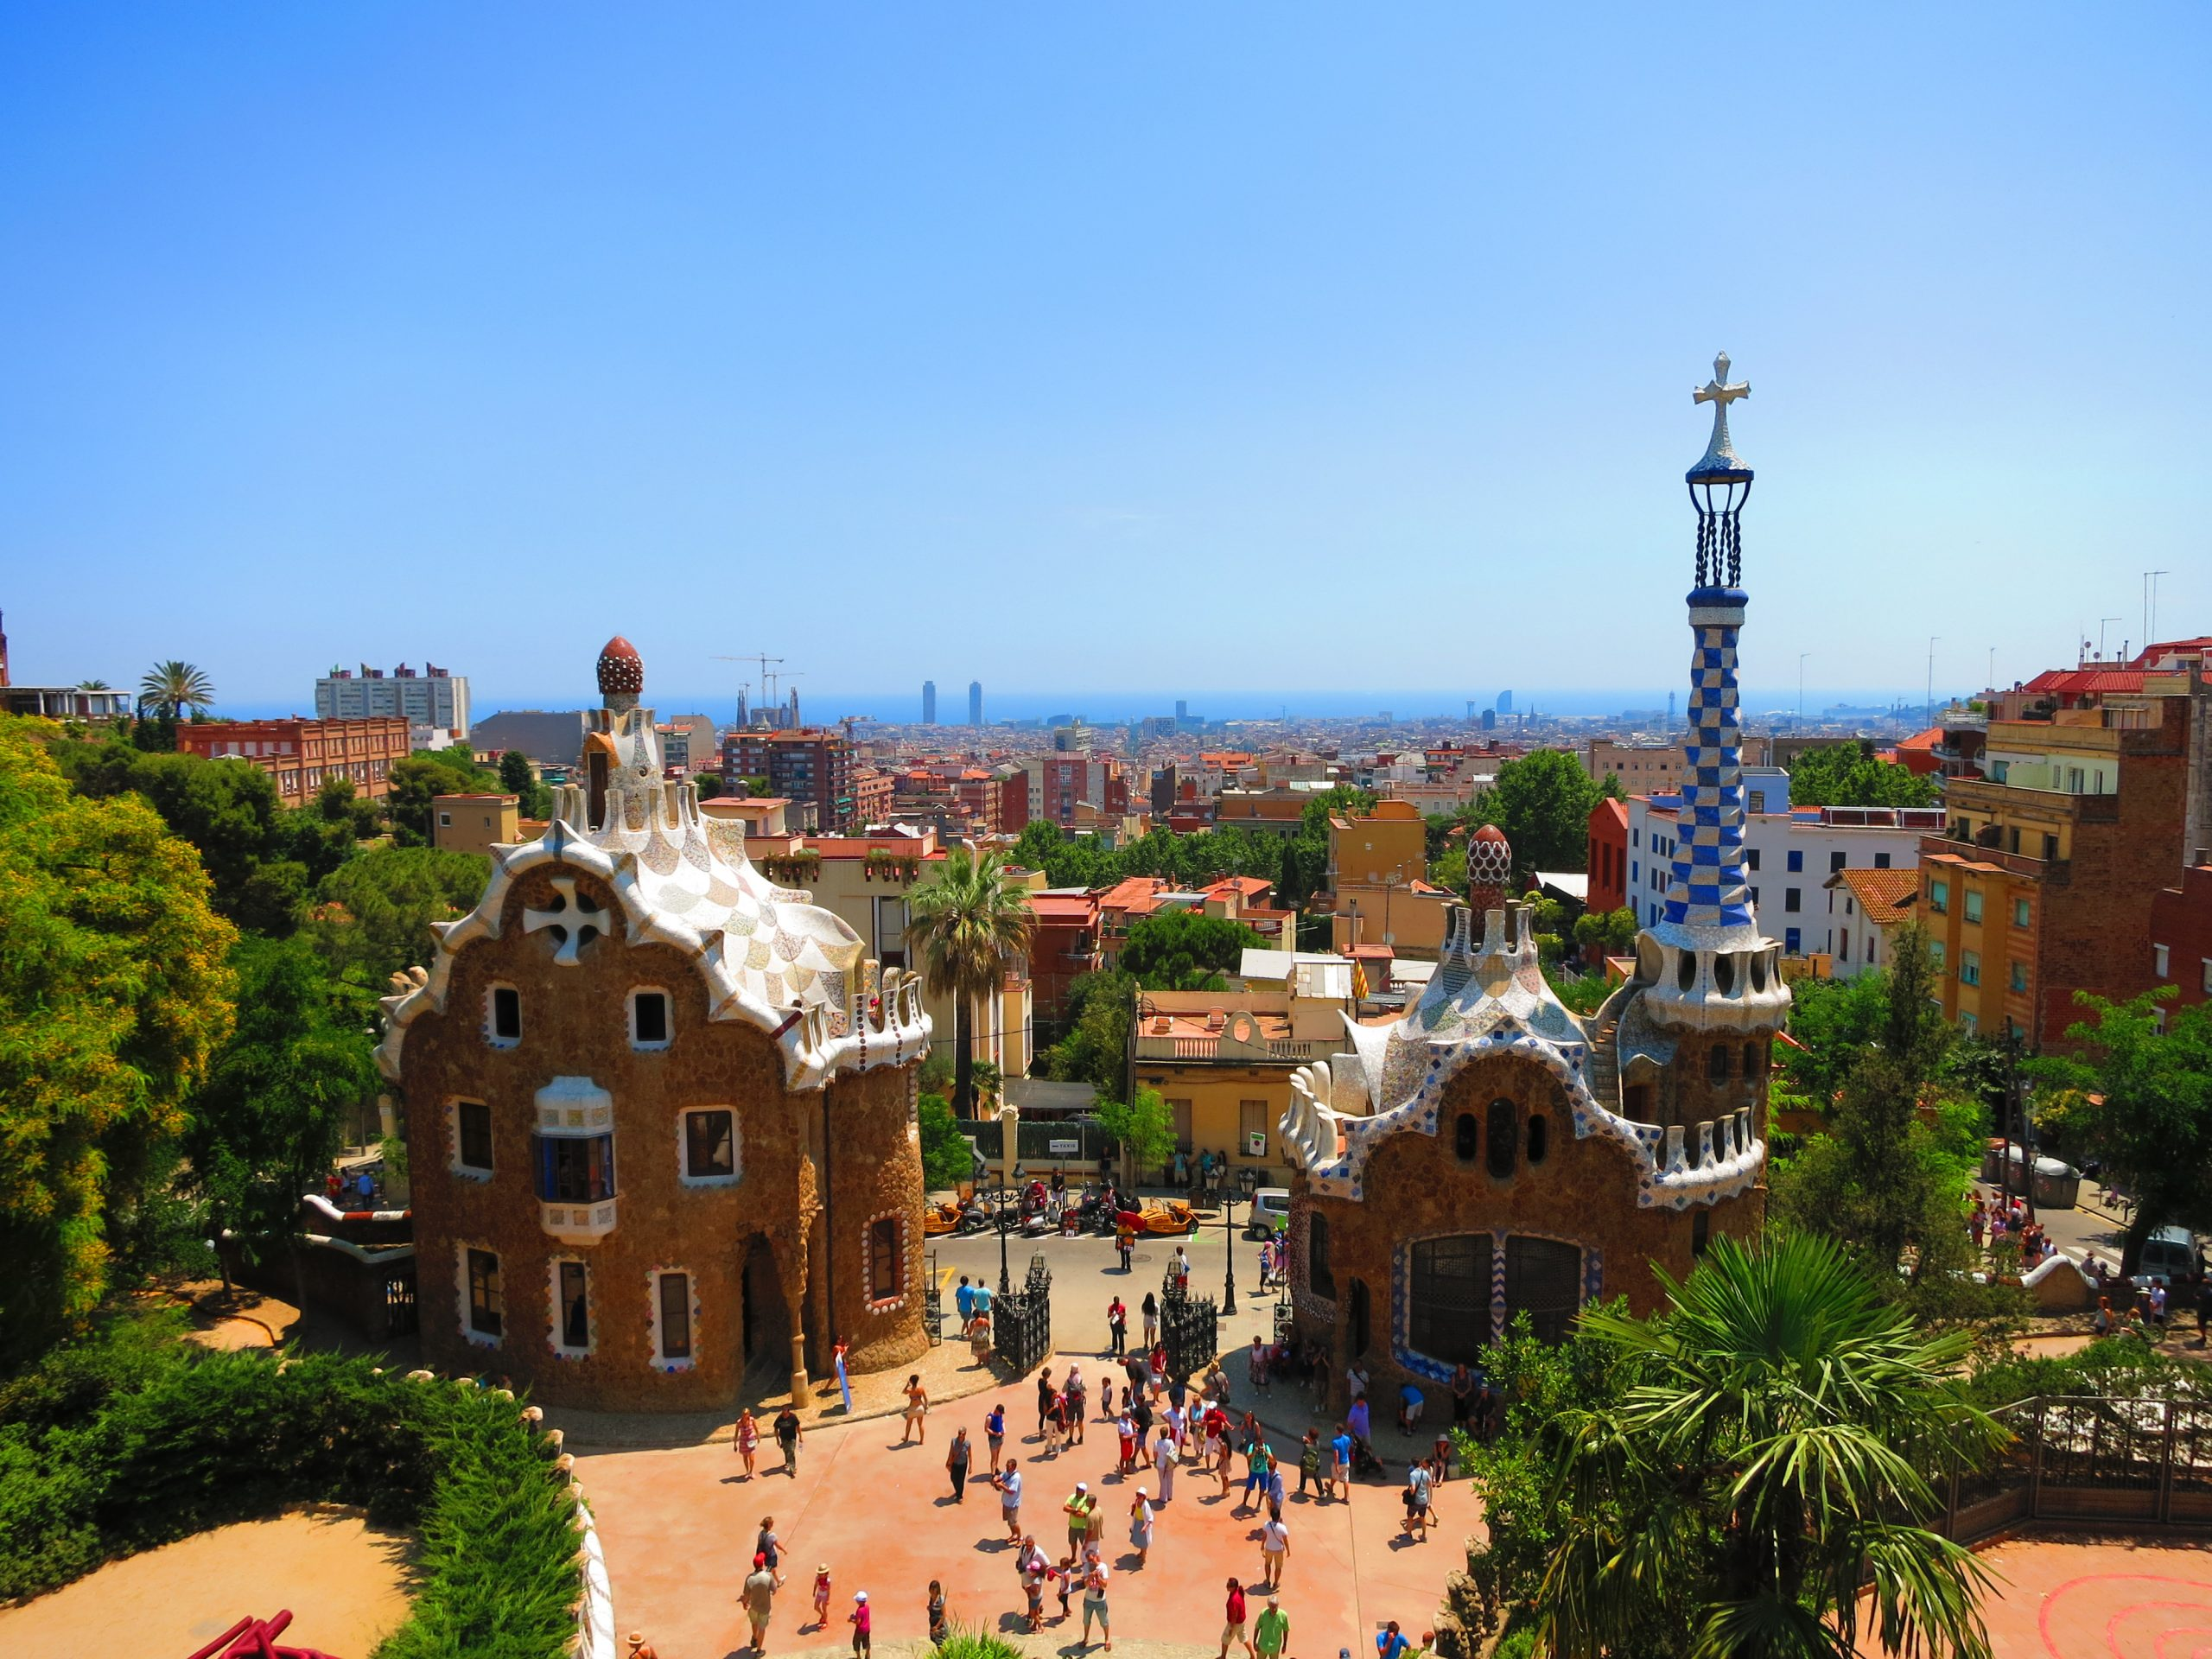 Why I'm voluntarily walking 800km across Spain…